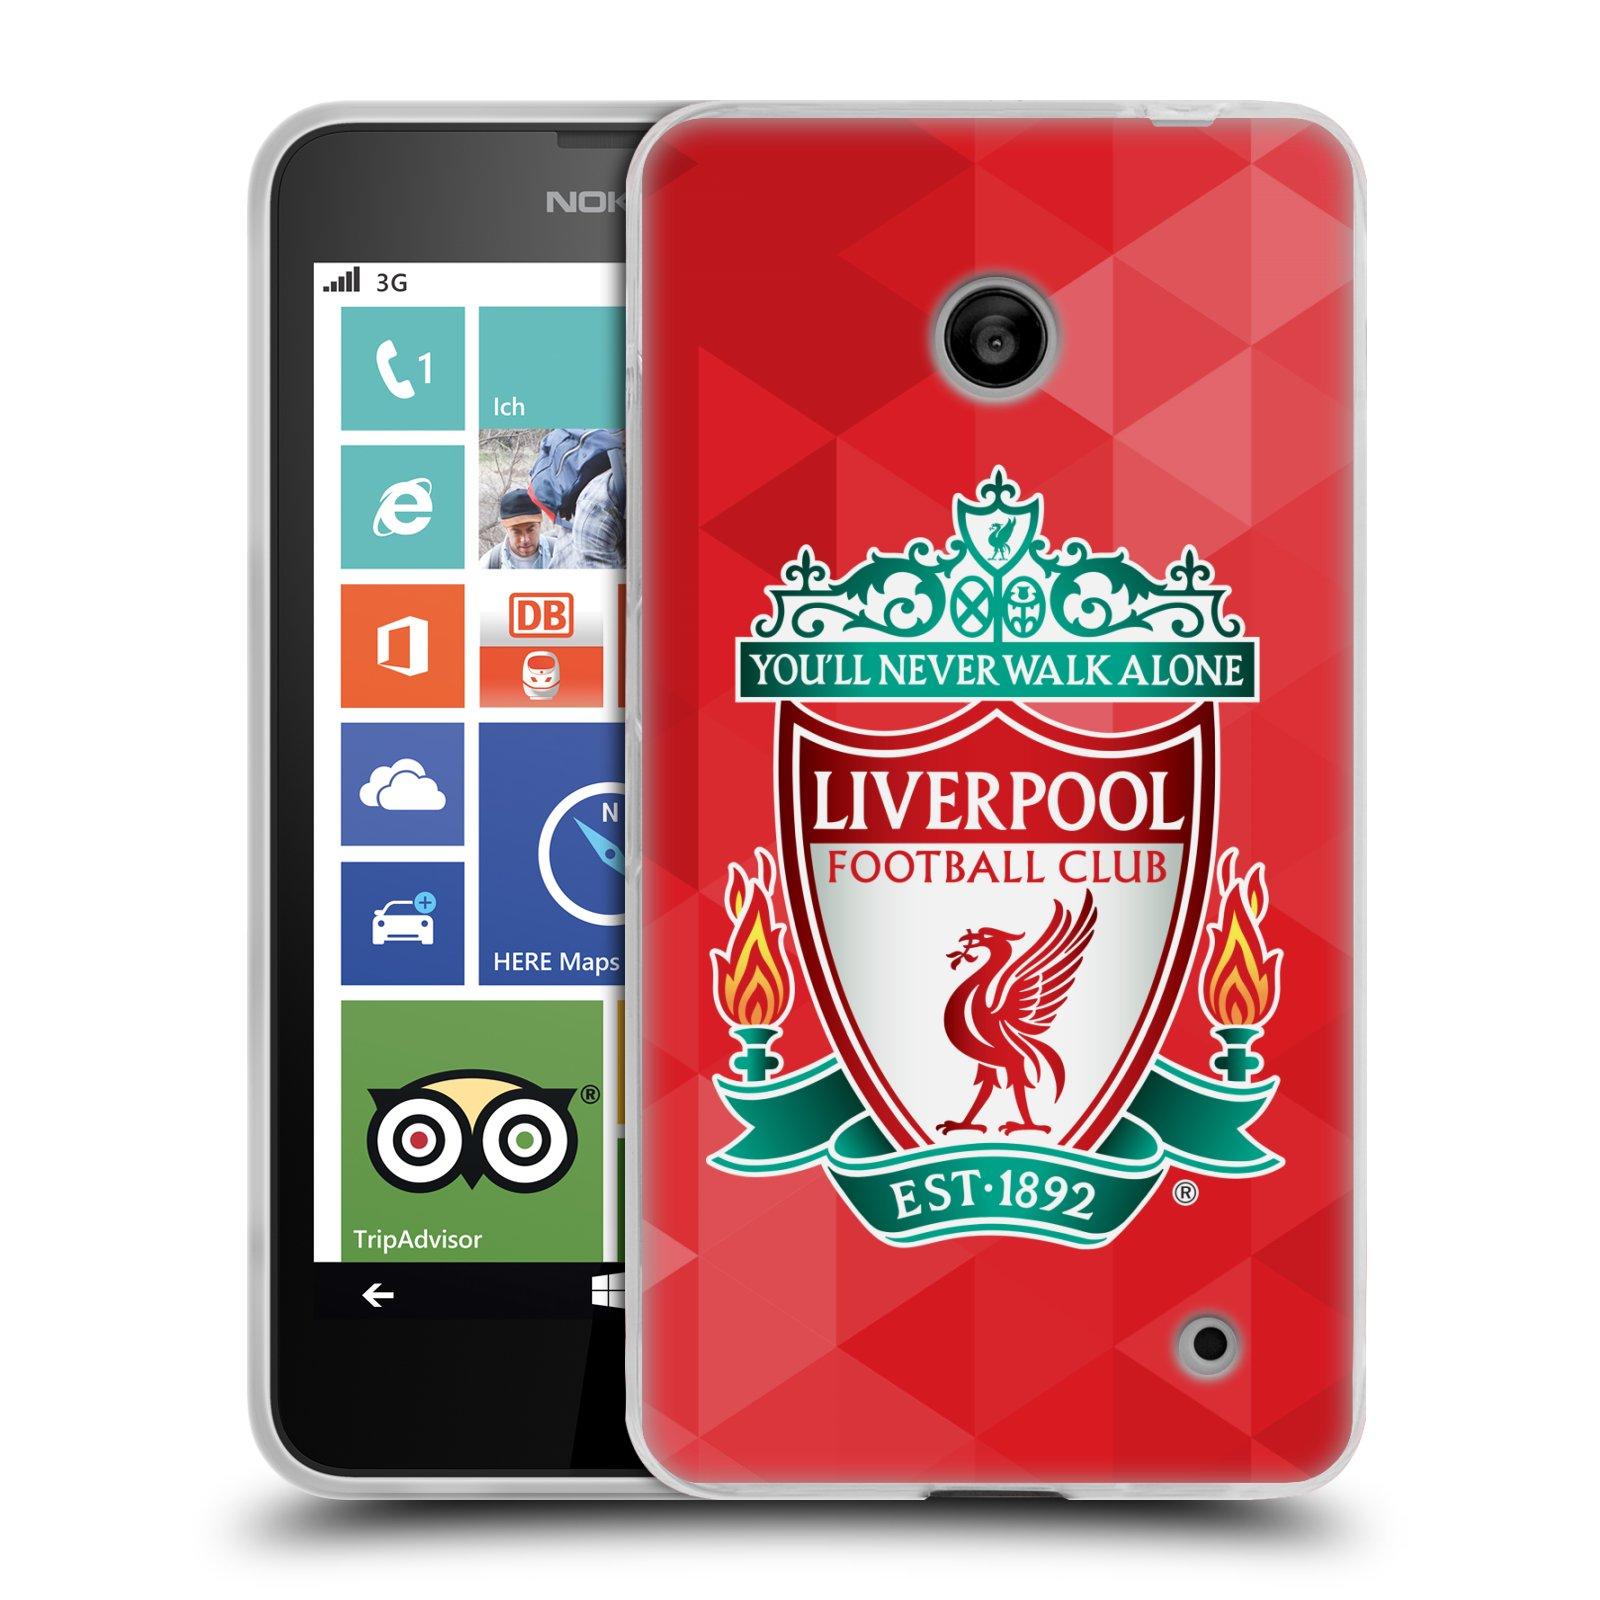 Silikonové pouzdro na mobil Nokia Lumia 630 HEAD CASE ZNAK LIVERPOOL FC OFFICIAL GEOMETRIC RED (Silikonový kryt či obal na mobilní telefon Liverpool FC Official pro Nokia Lumia 630 a Nokia Lumia 630 Dual SIM)